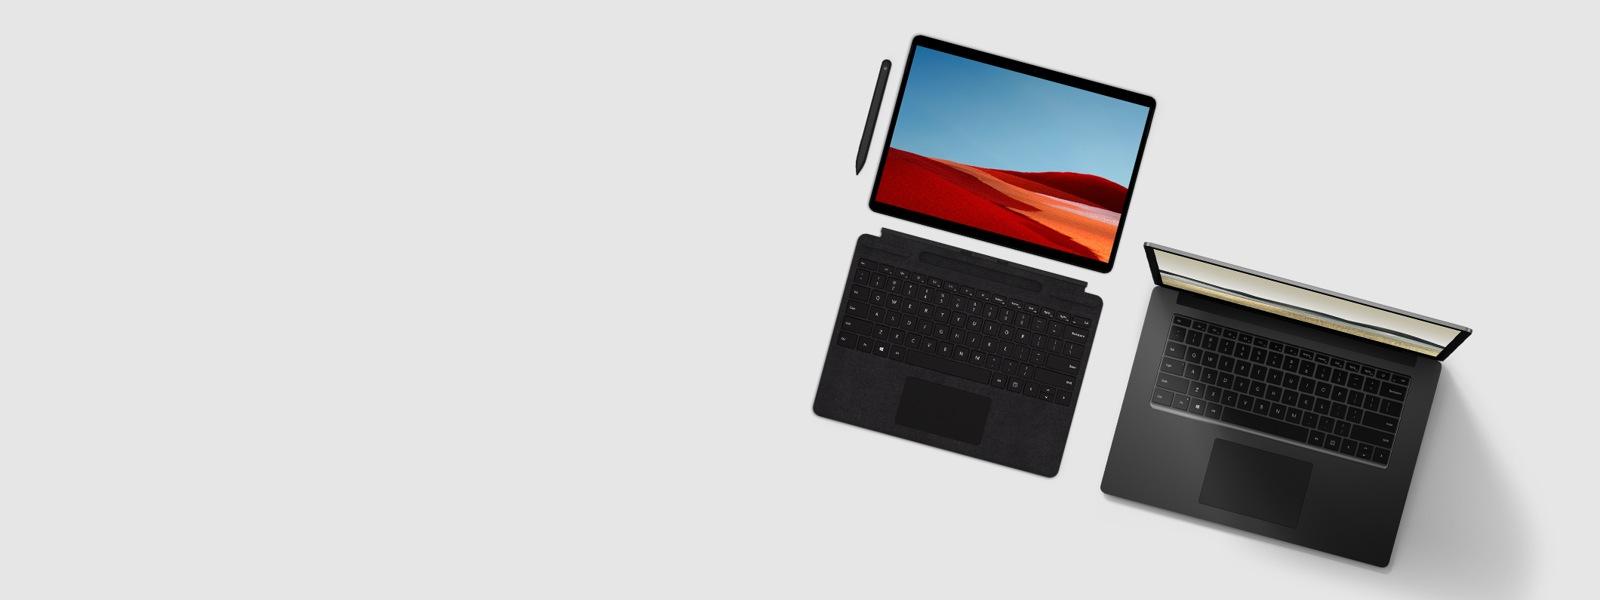 Immagine di un dispositivo Surface Laptop 3 e un dispositivo Surface Pro X su sfondo neutro